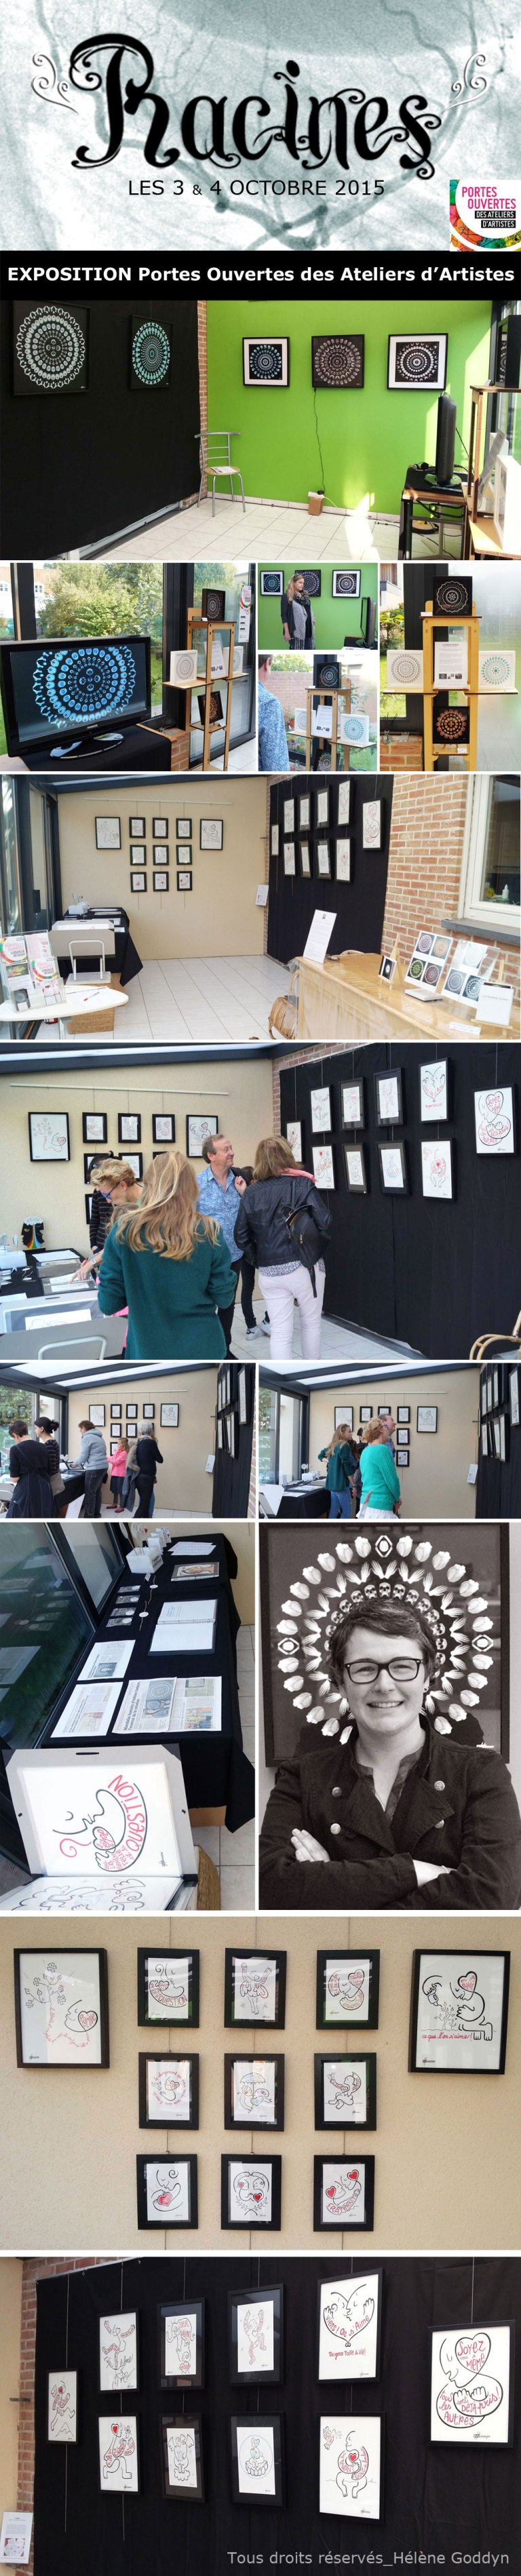 Exposition-Racine_Helene-Goddyn_3-4-octobre_toutes-les-photos